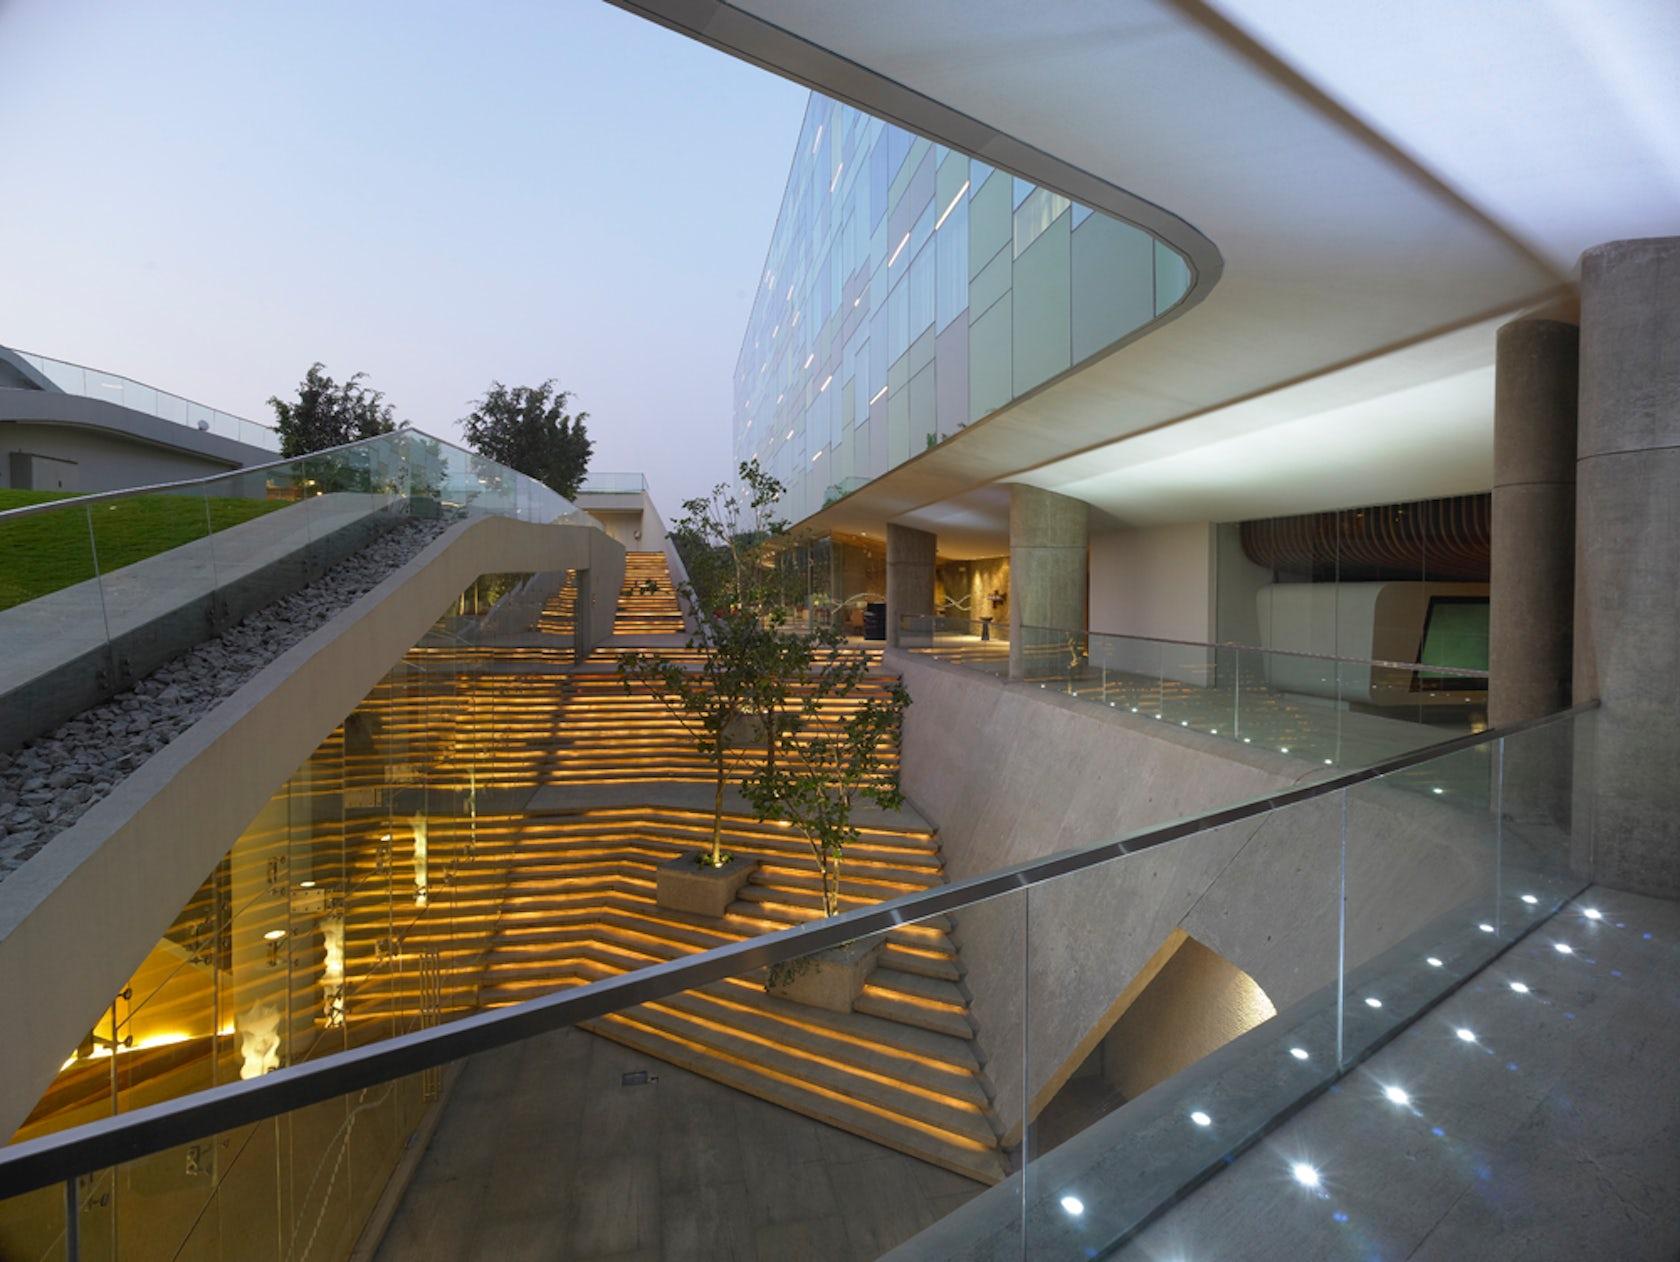 Vivanta by taj whitefield bangalore architizer for Design hotel few steps from the david